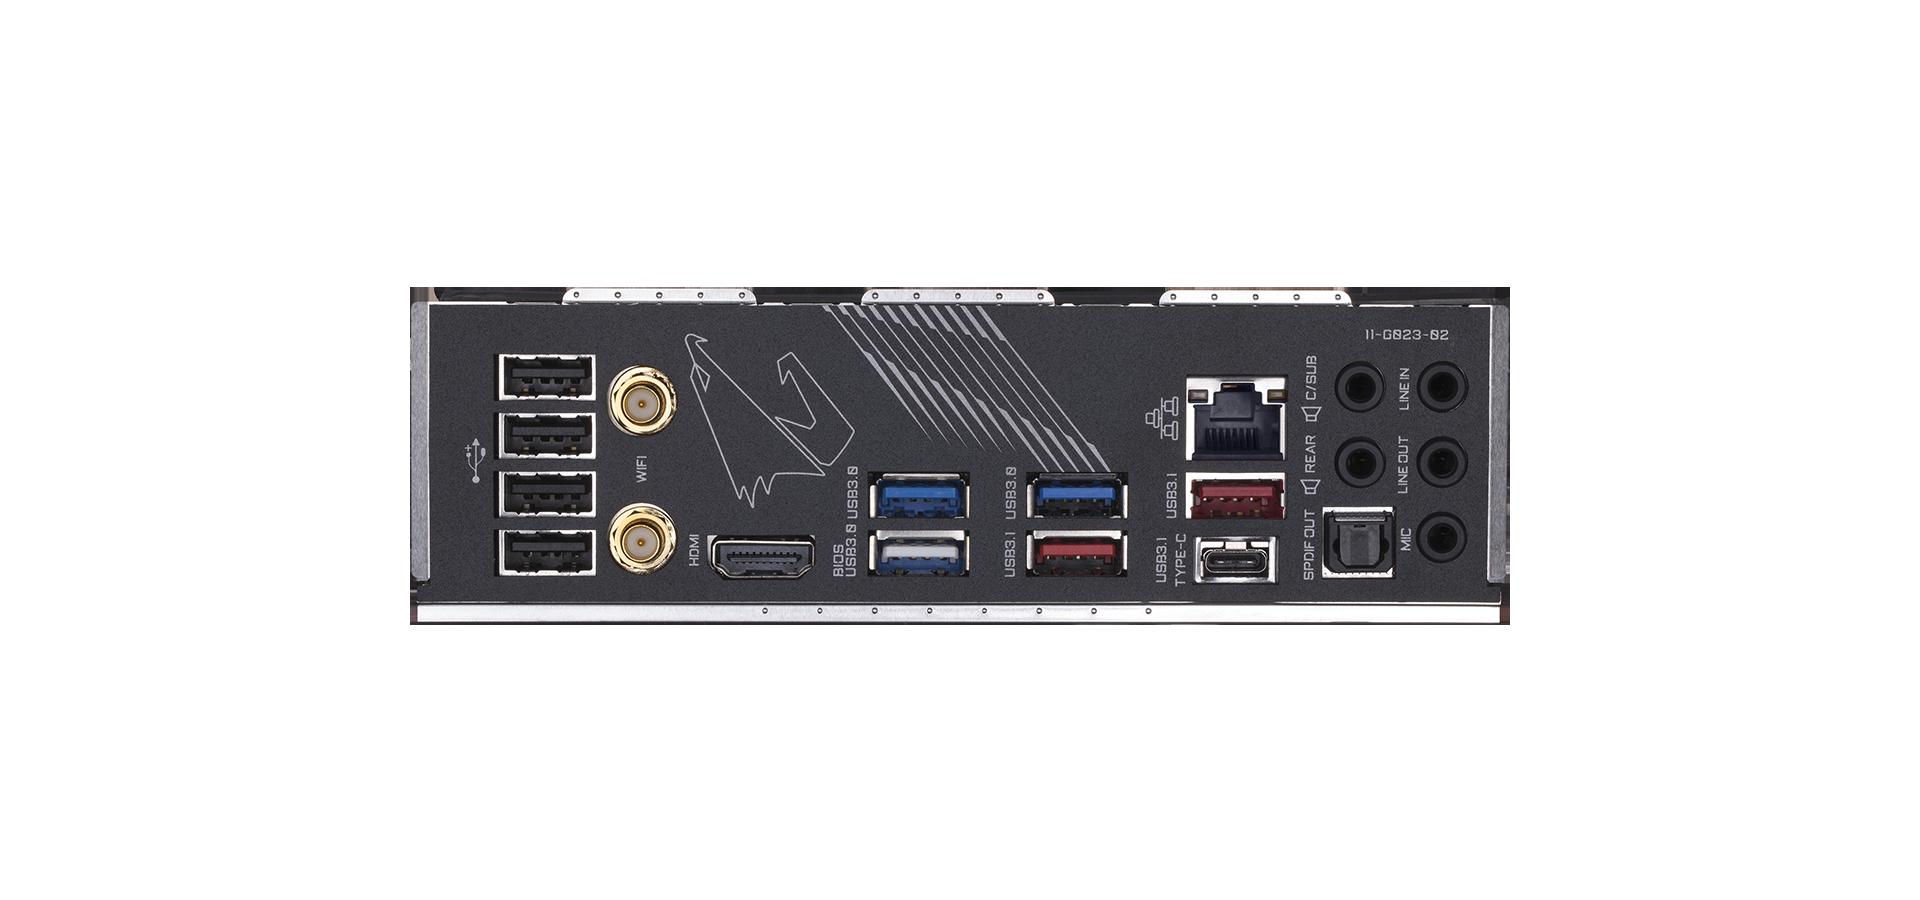 X570 AORUS PRO WIFI (rev  1 0) | Motherboard - GIGABYTE U S A